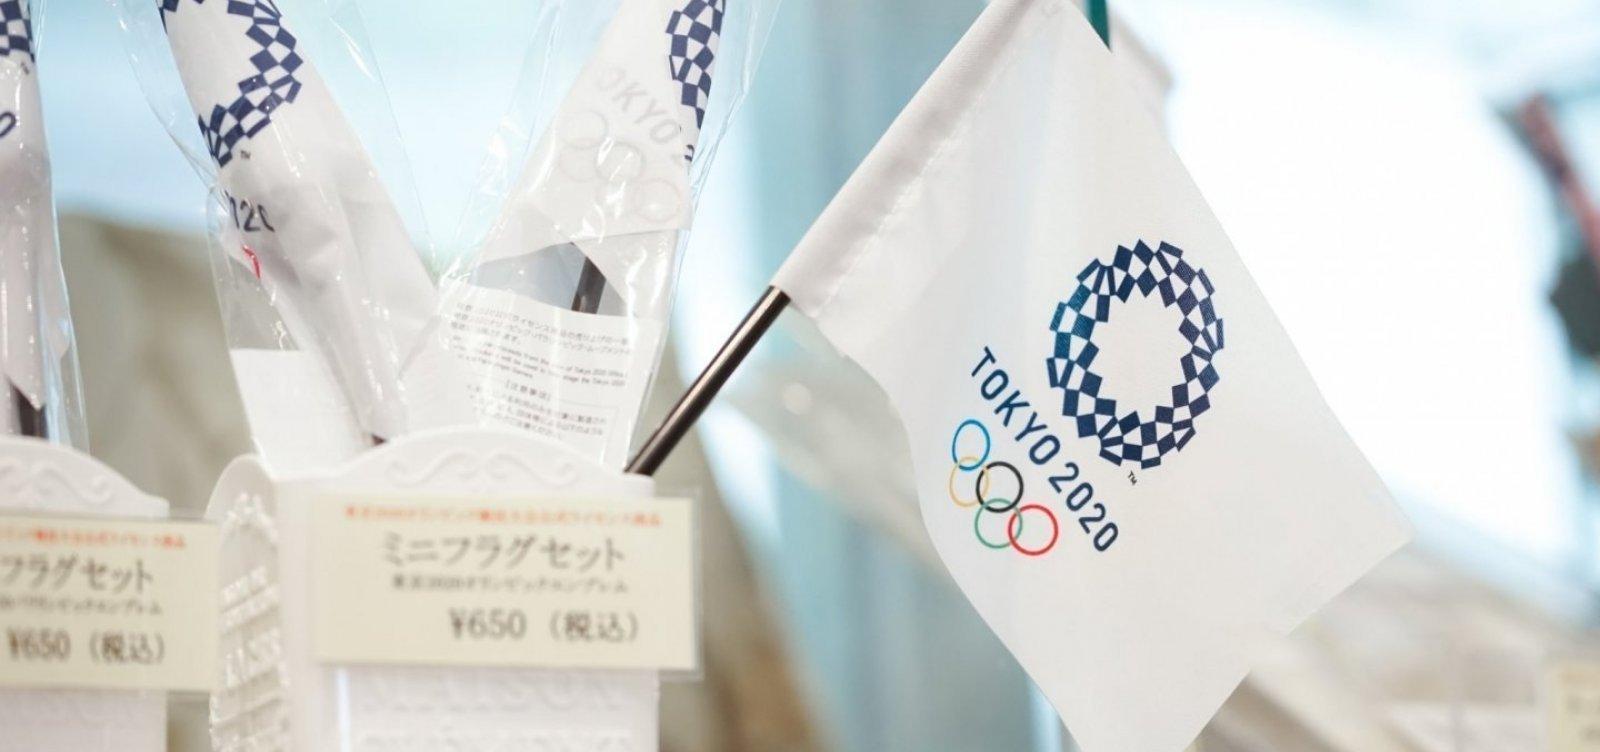 Total de casos confirmados de Covid-19 sobe para 110 nas Olimpíadas